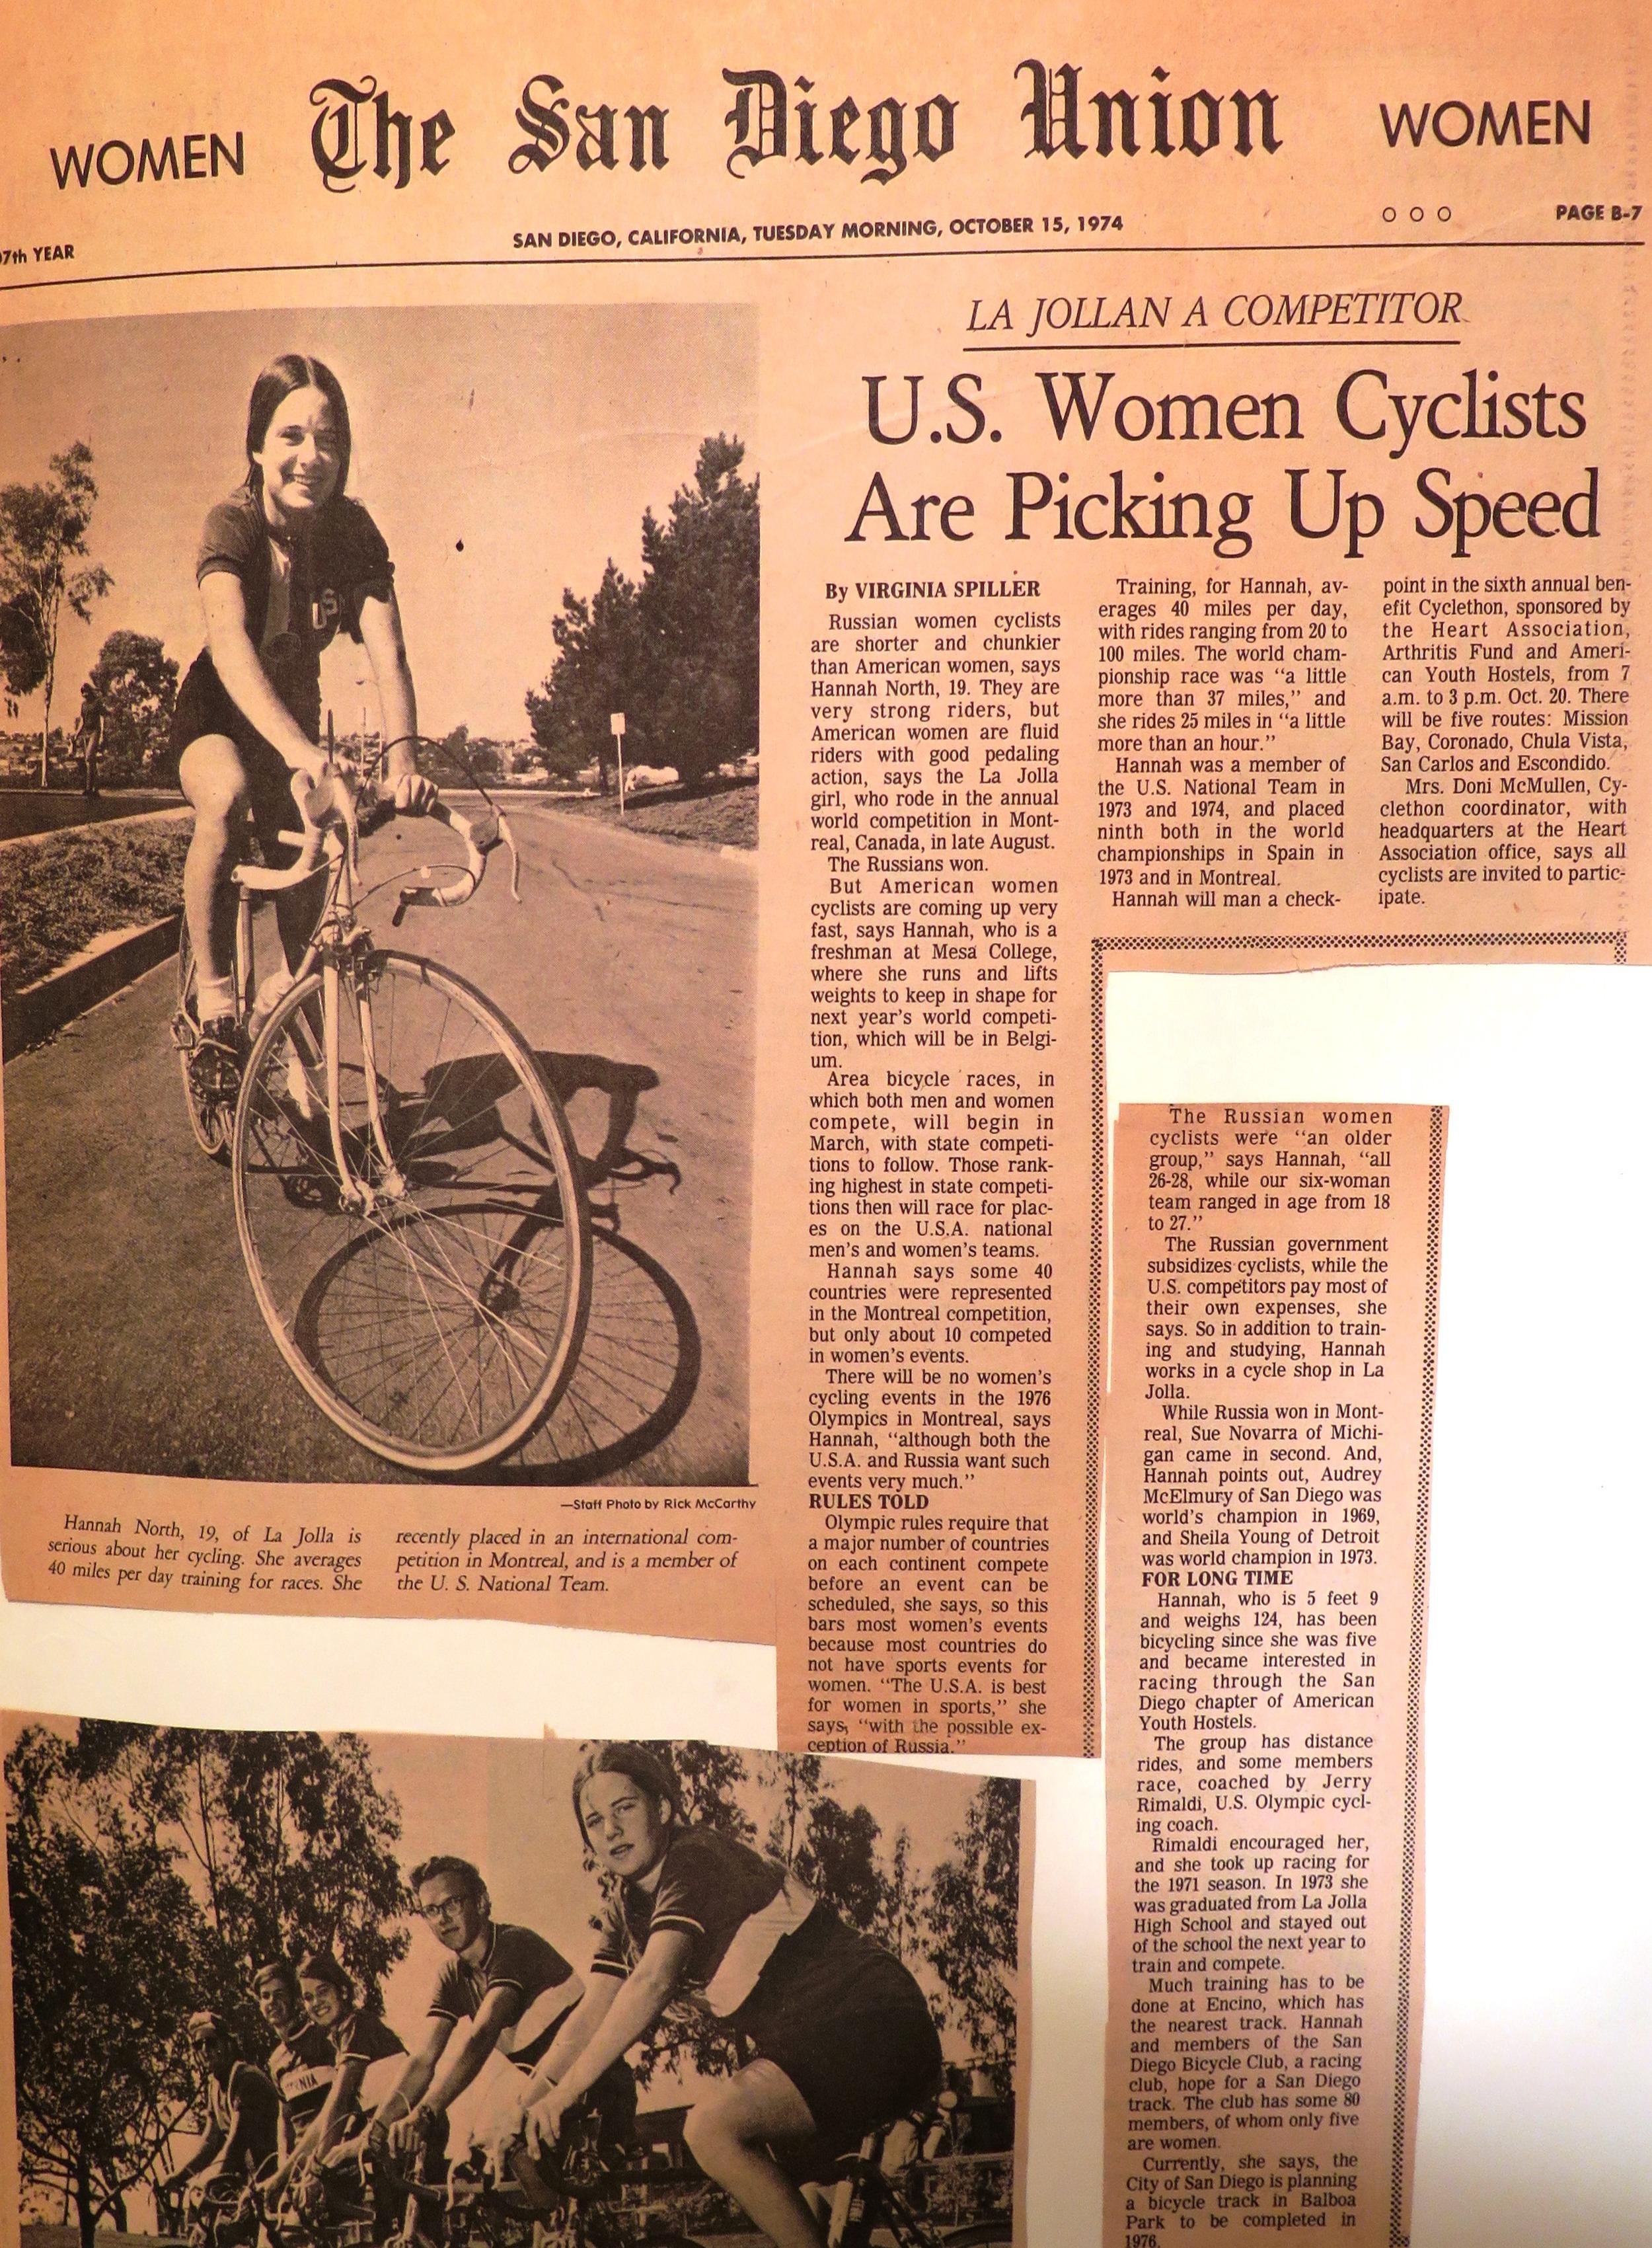 1974 Union Tribune article about Hannah North